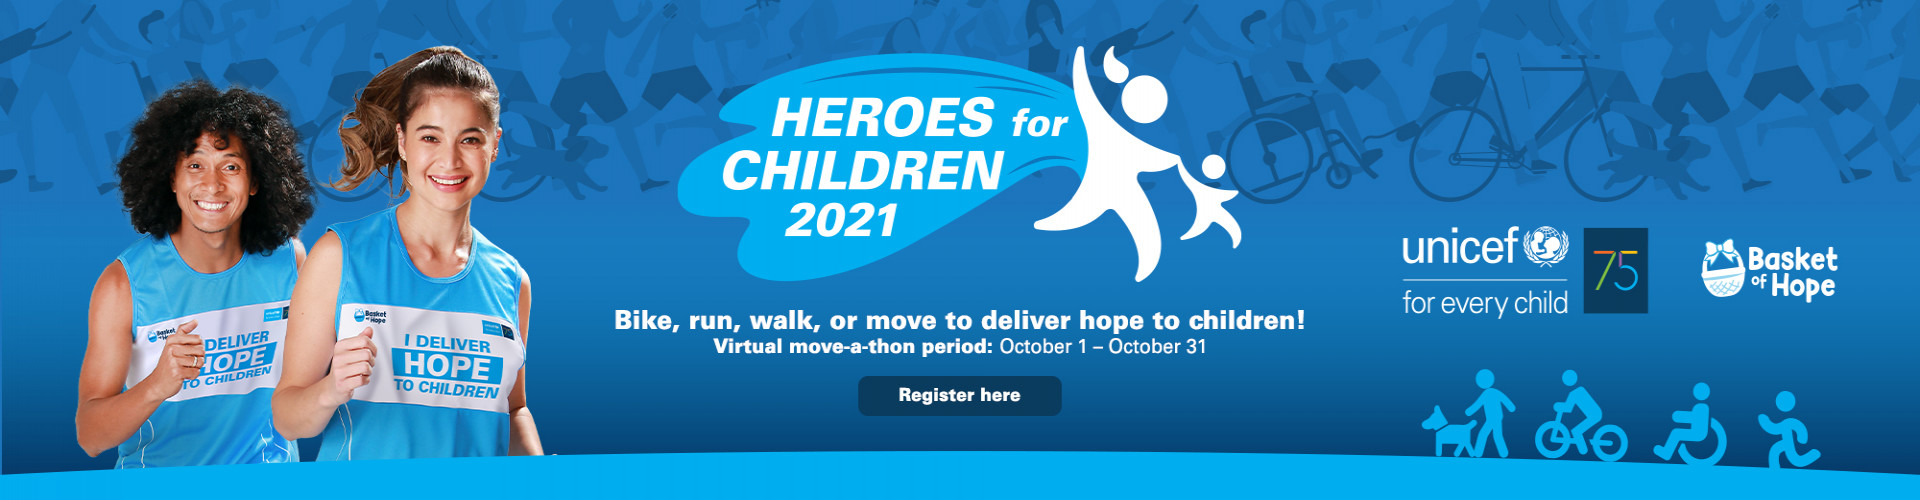 Unicef Heroes for Children 2021